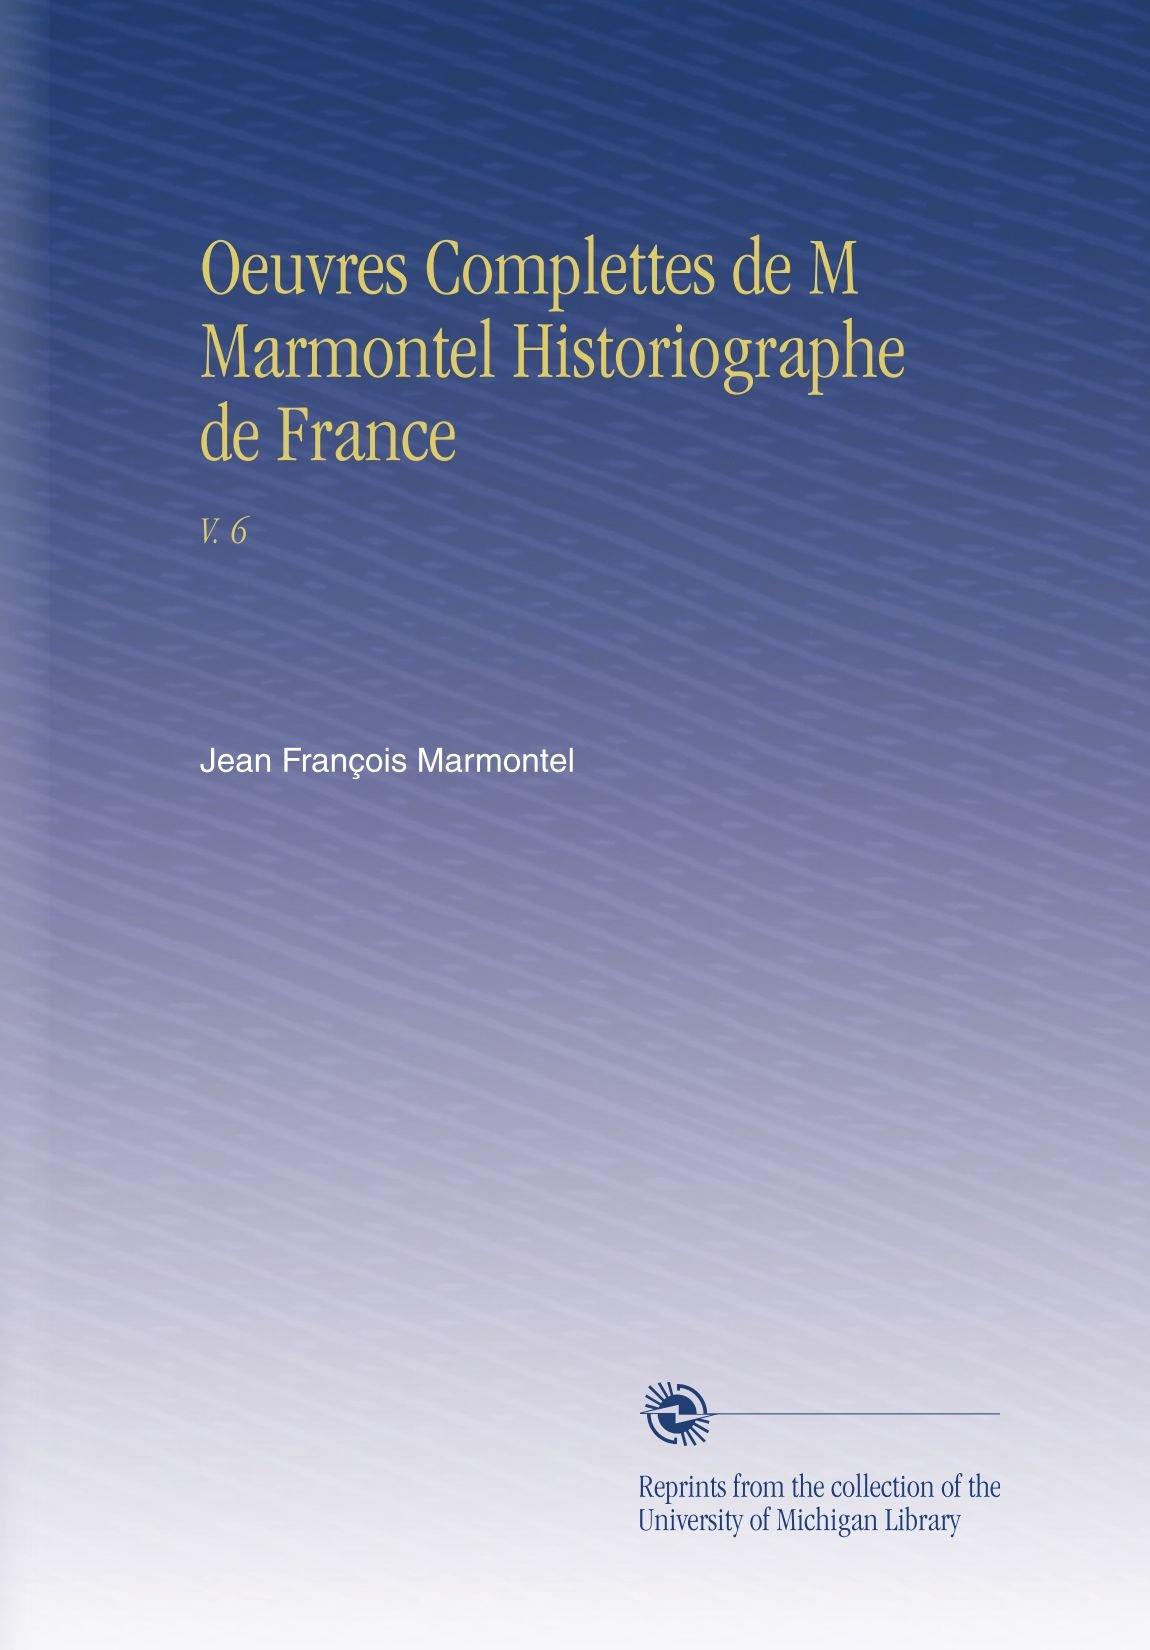 Download Oeuvres Complettes de M Marmontel Historiographe de France: V. 6 (French Edition) PDF